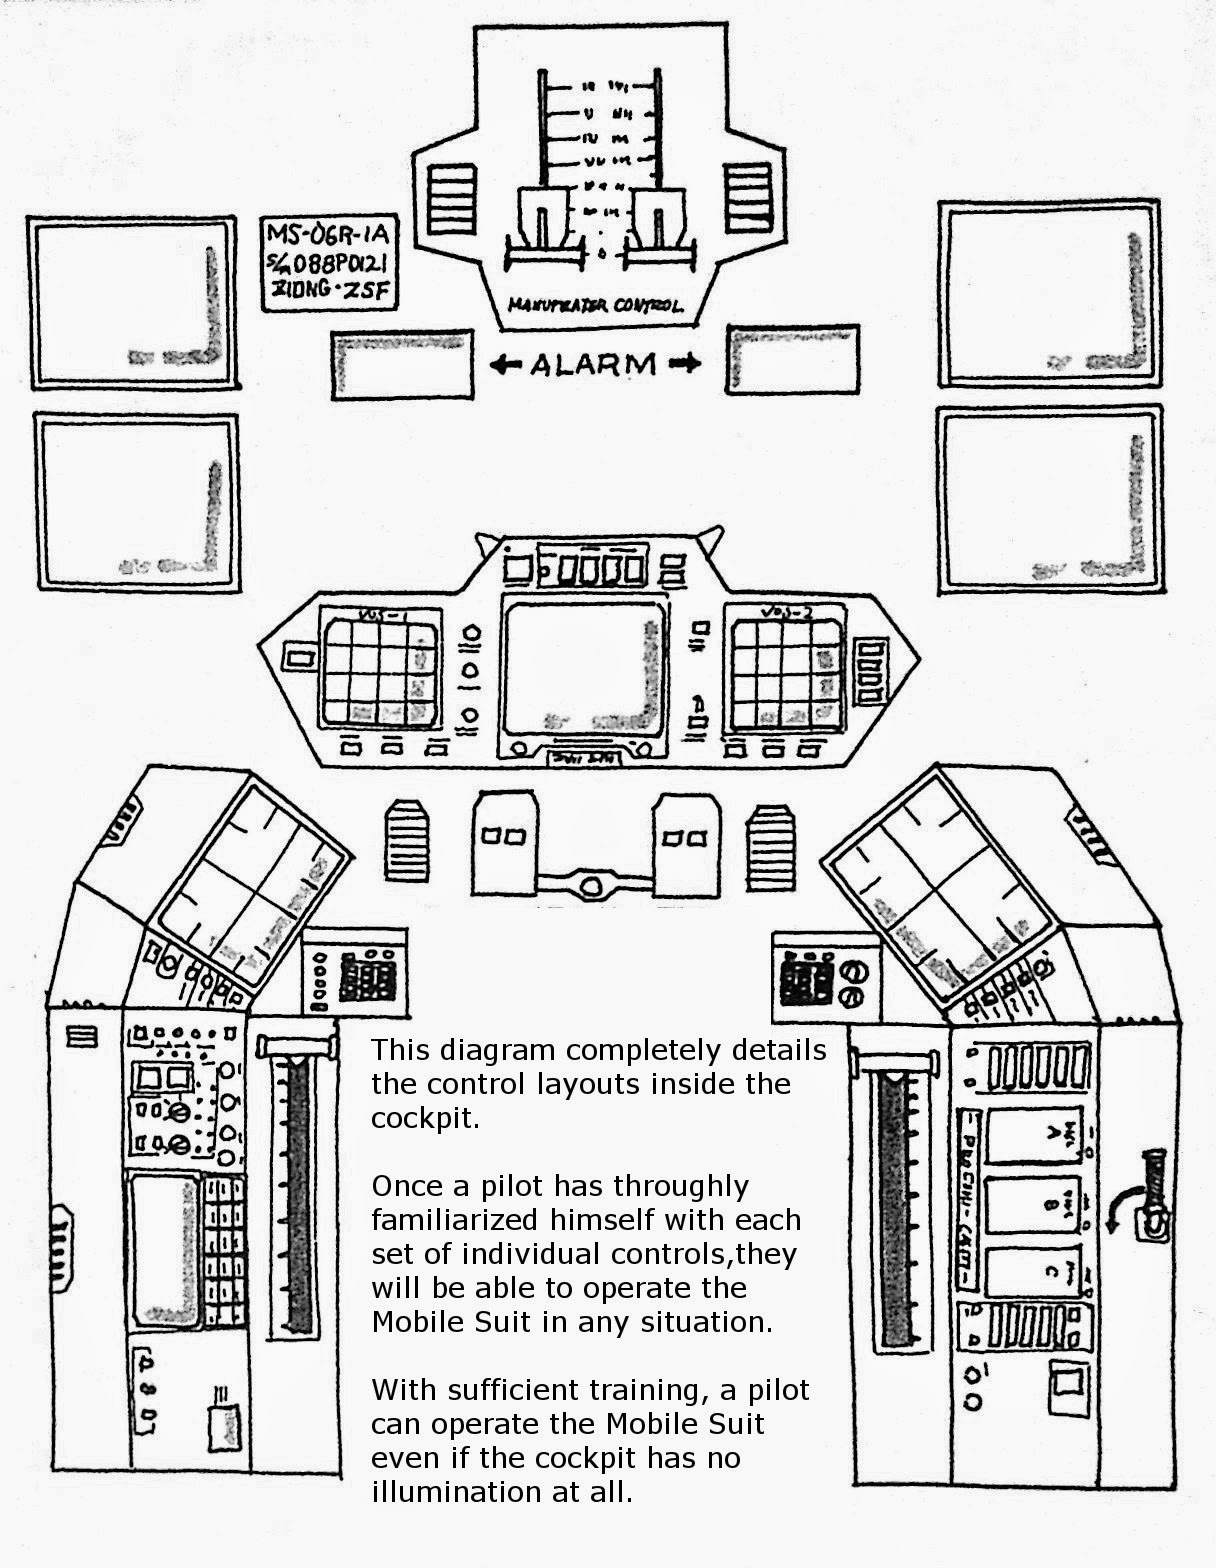 Anaheim Journal: MS-06R-1A Technical Manual